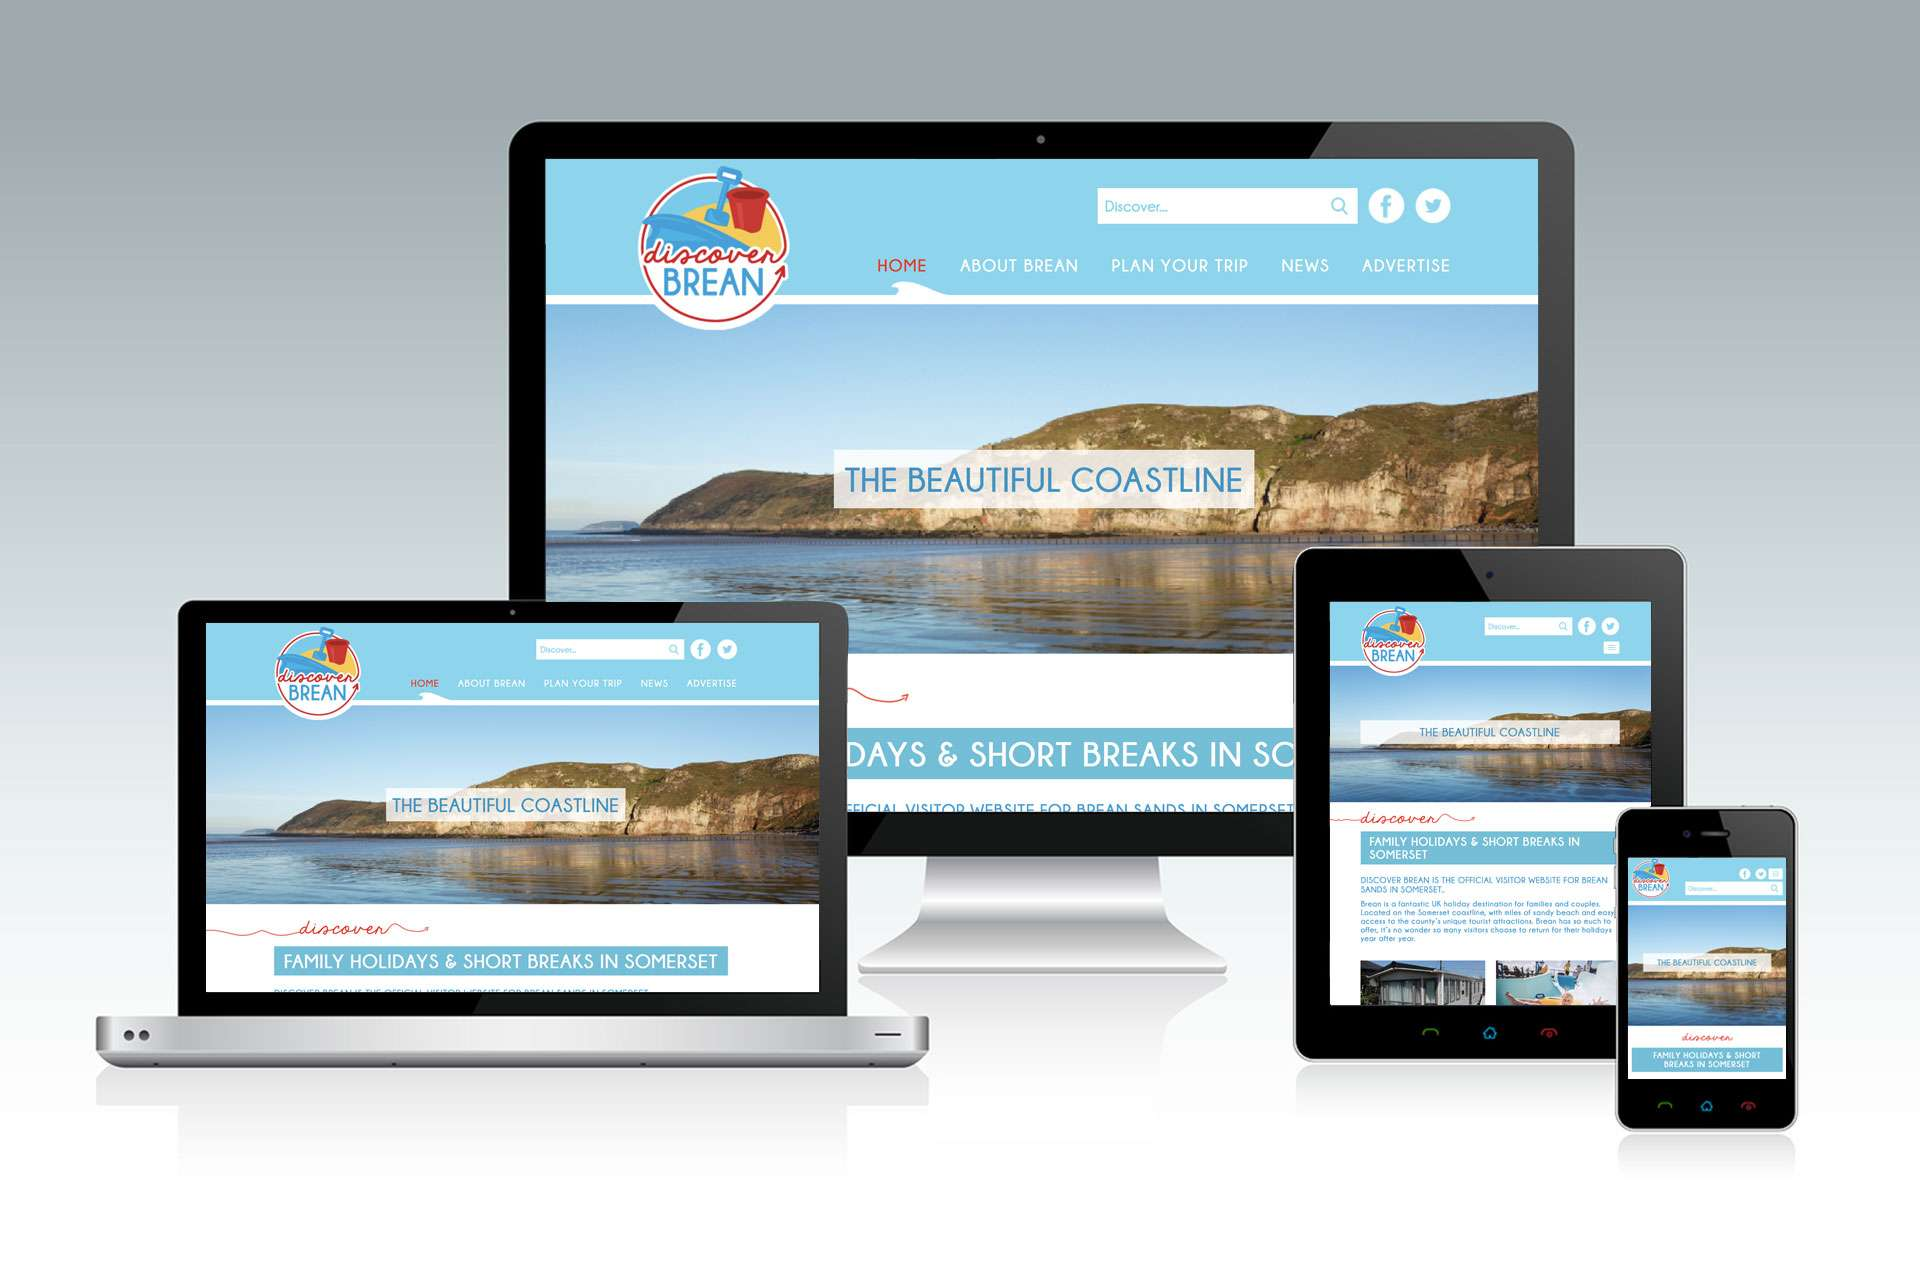 Discover Brean tourism website design, Somerset